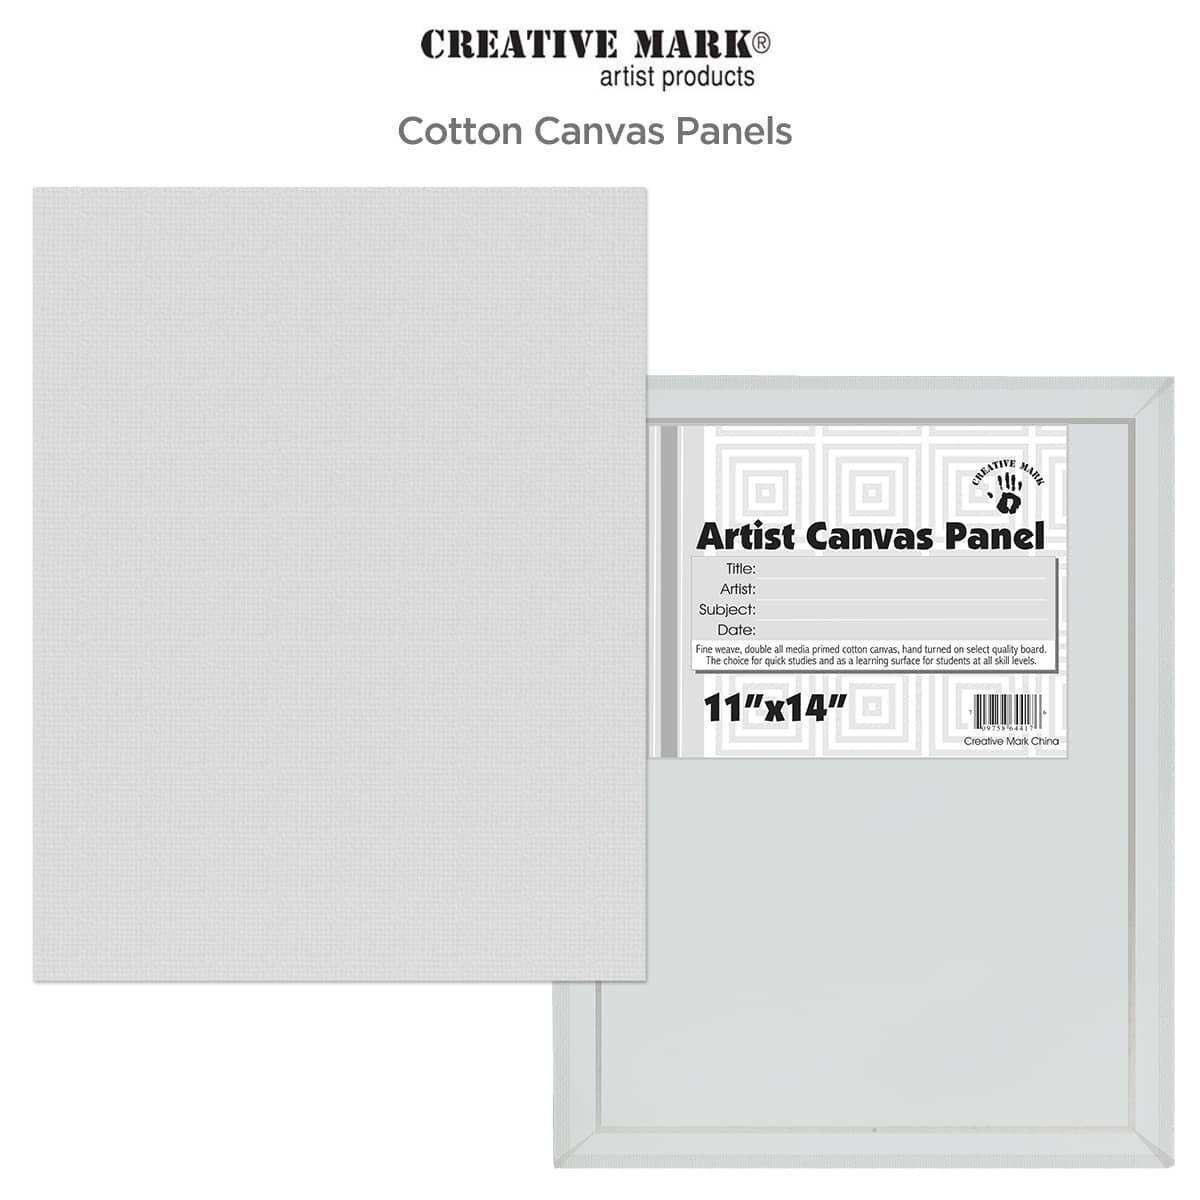 Economy Canvas Panels 8X10 Box of 50 Bulk Discount White Acid Free Artist Canvas